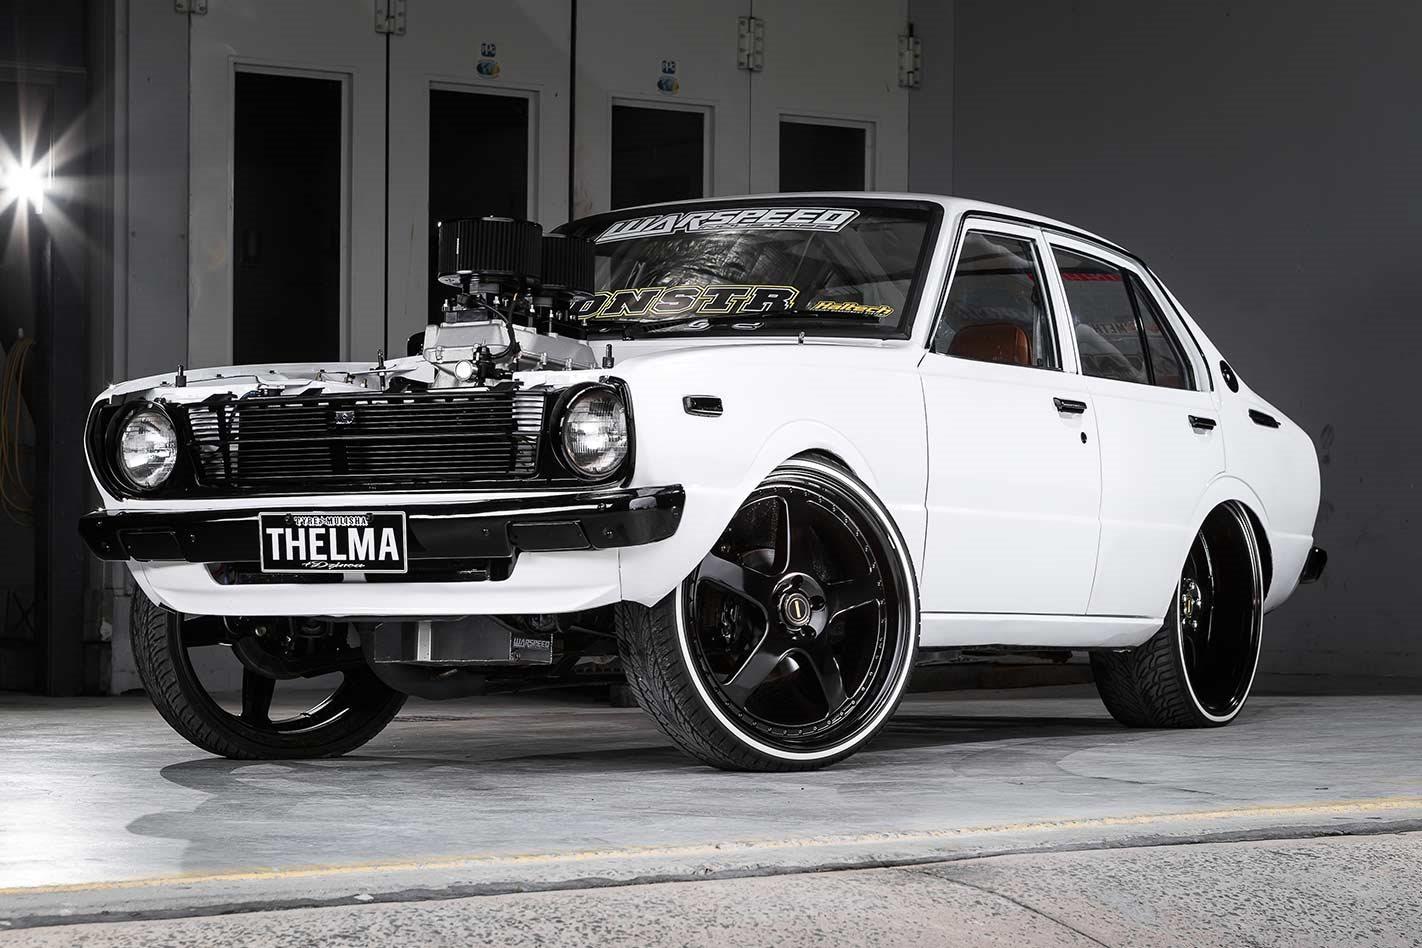 LS-powered 1978 Toyota KE30 Corolla